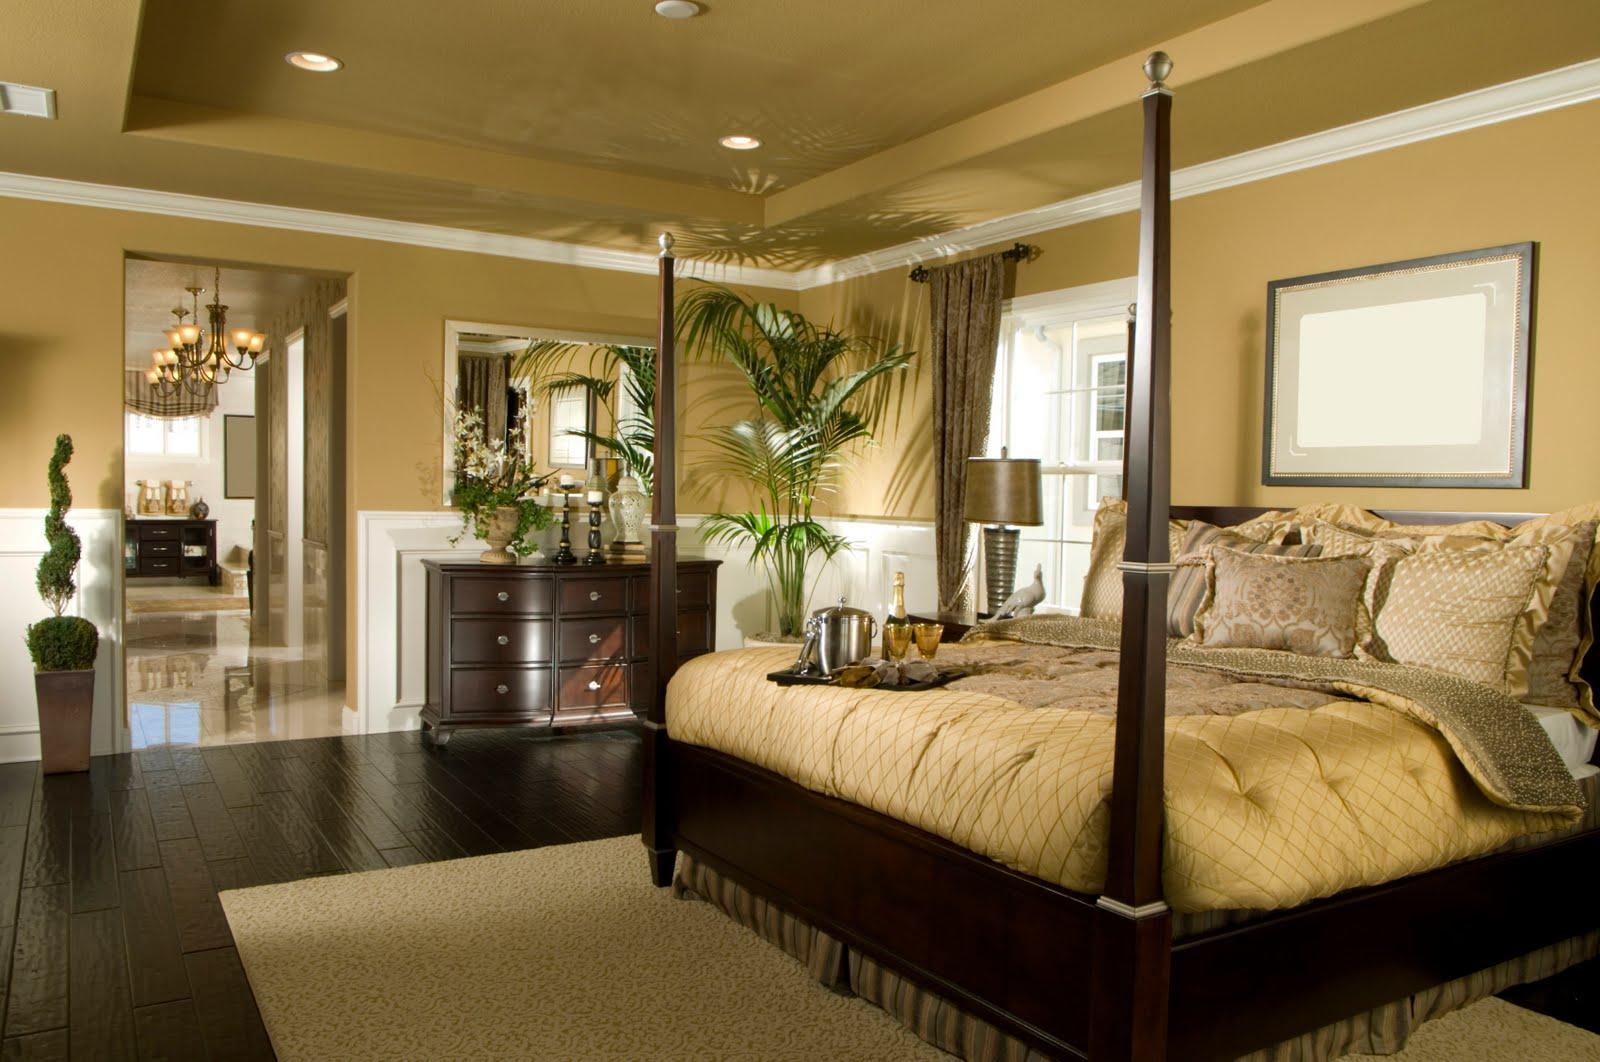 centerville luxury propertymillion dollar homes for sale